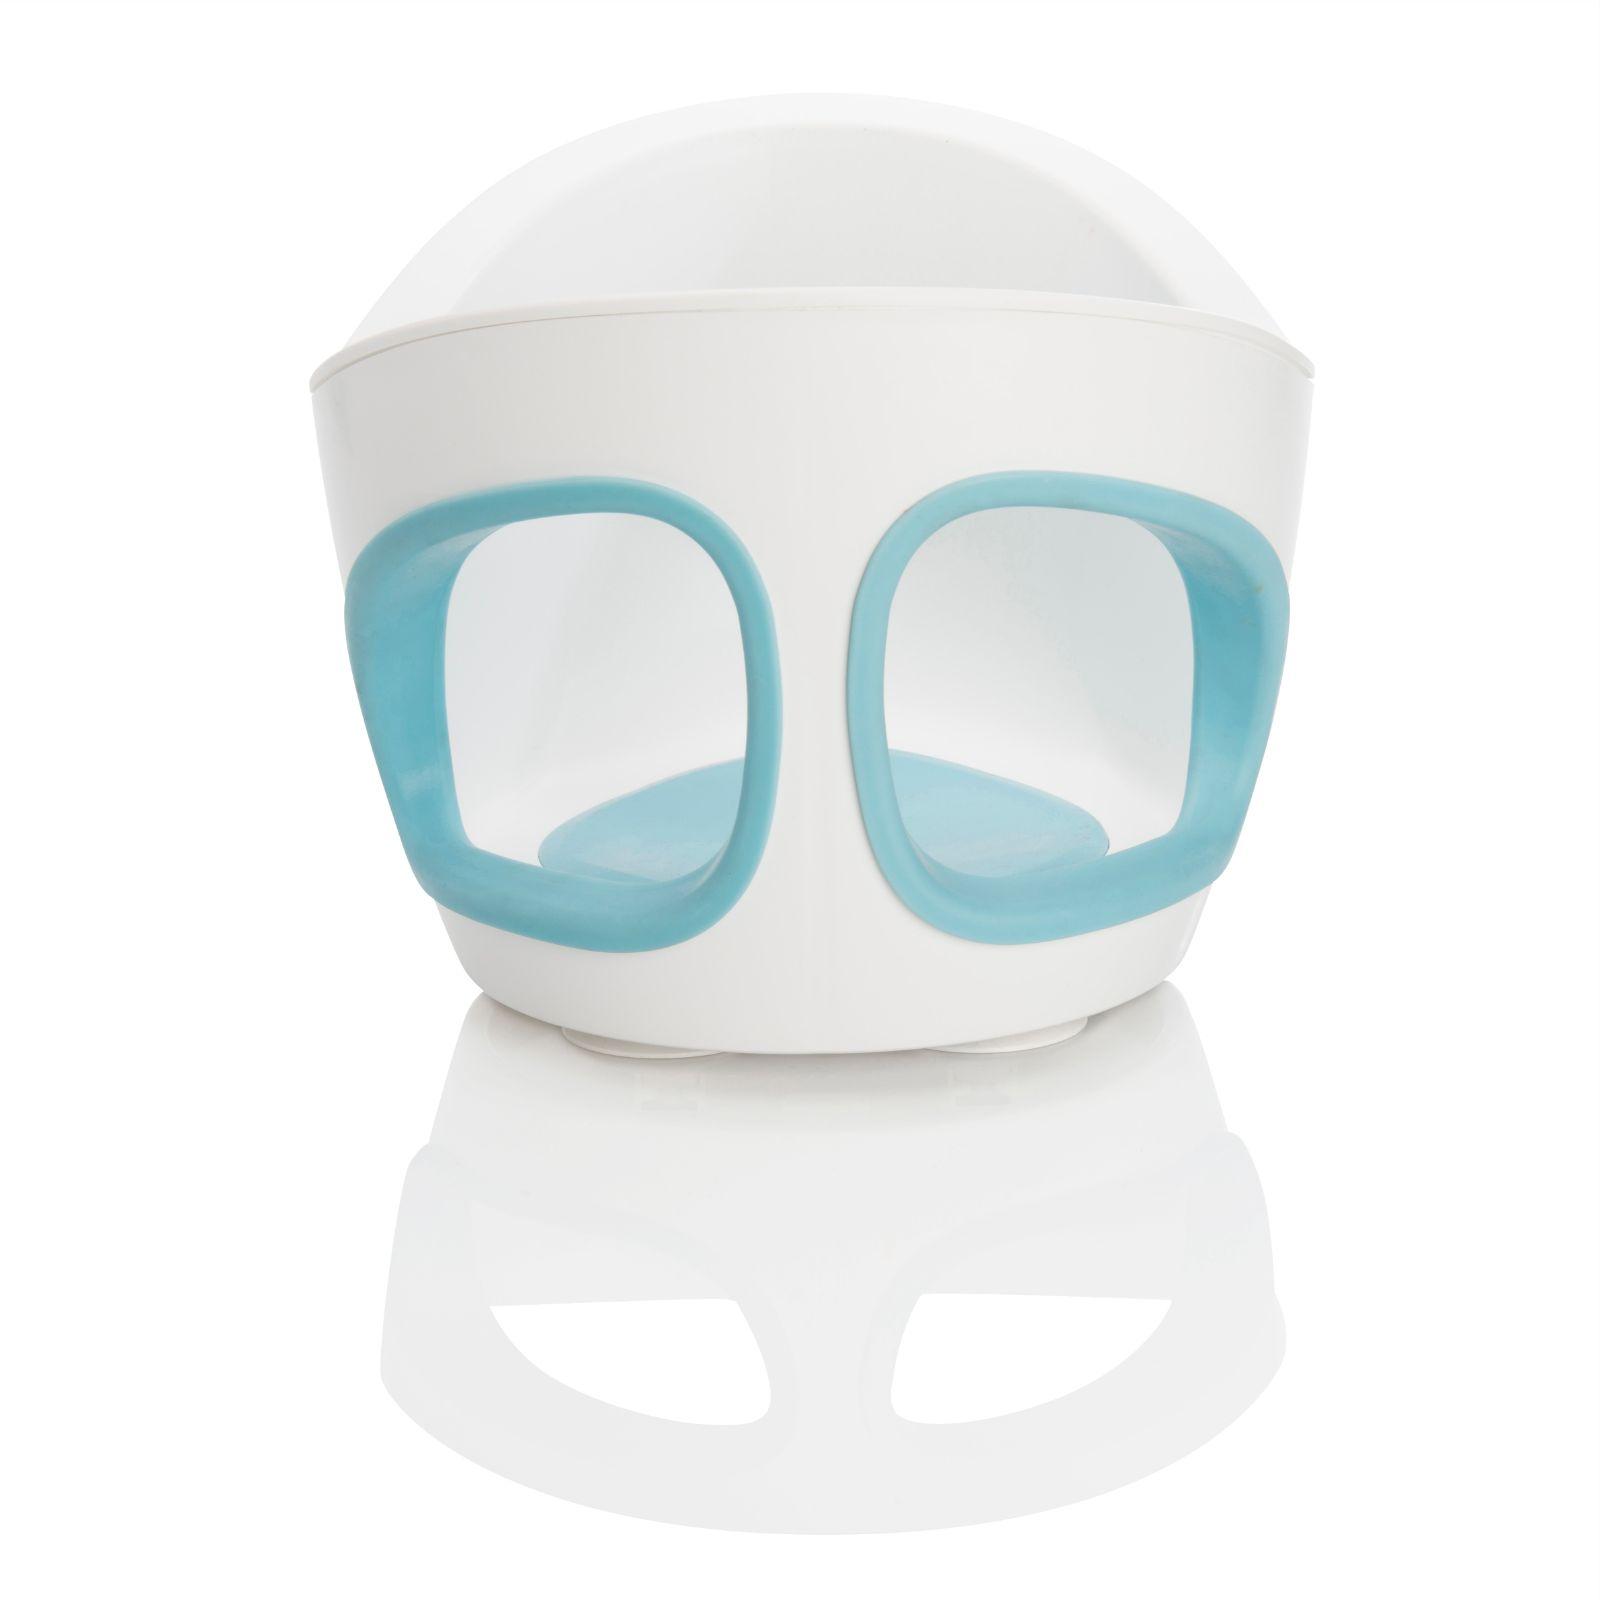 Babymoov Aquaseat Baby Bath Seat - White | Buy at Online4baby